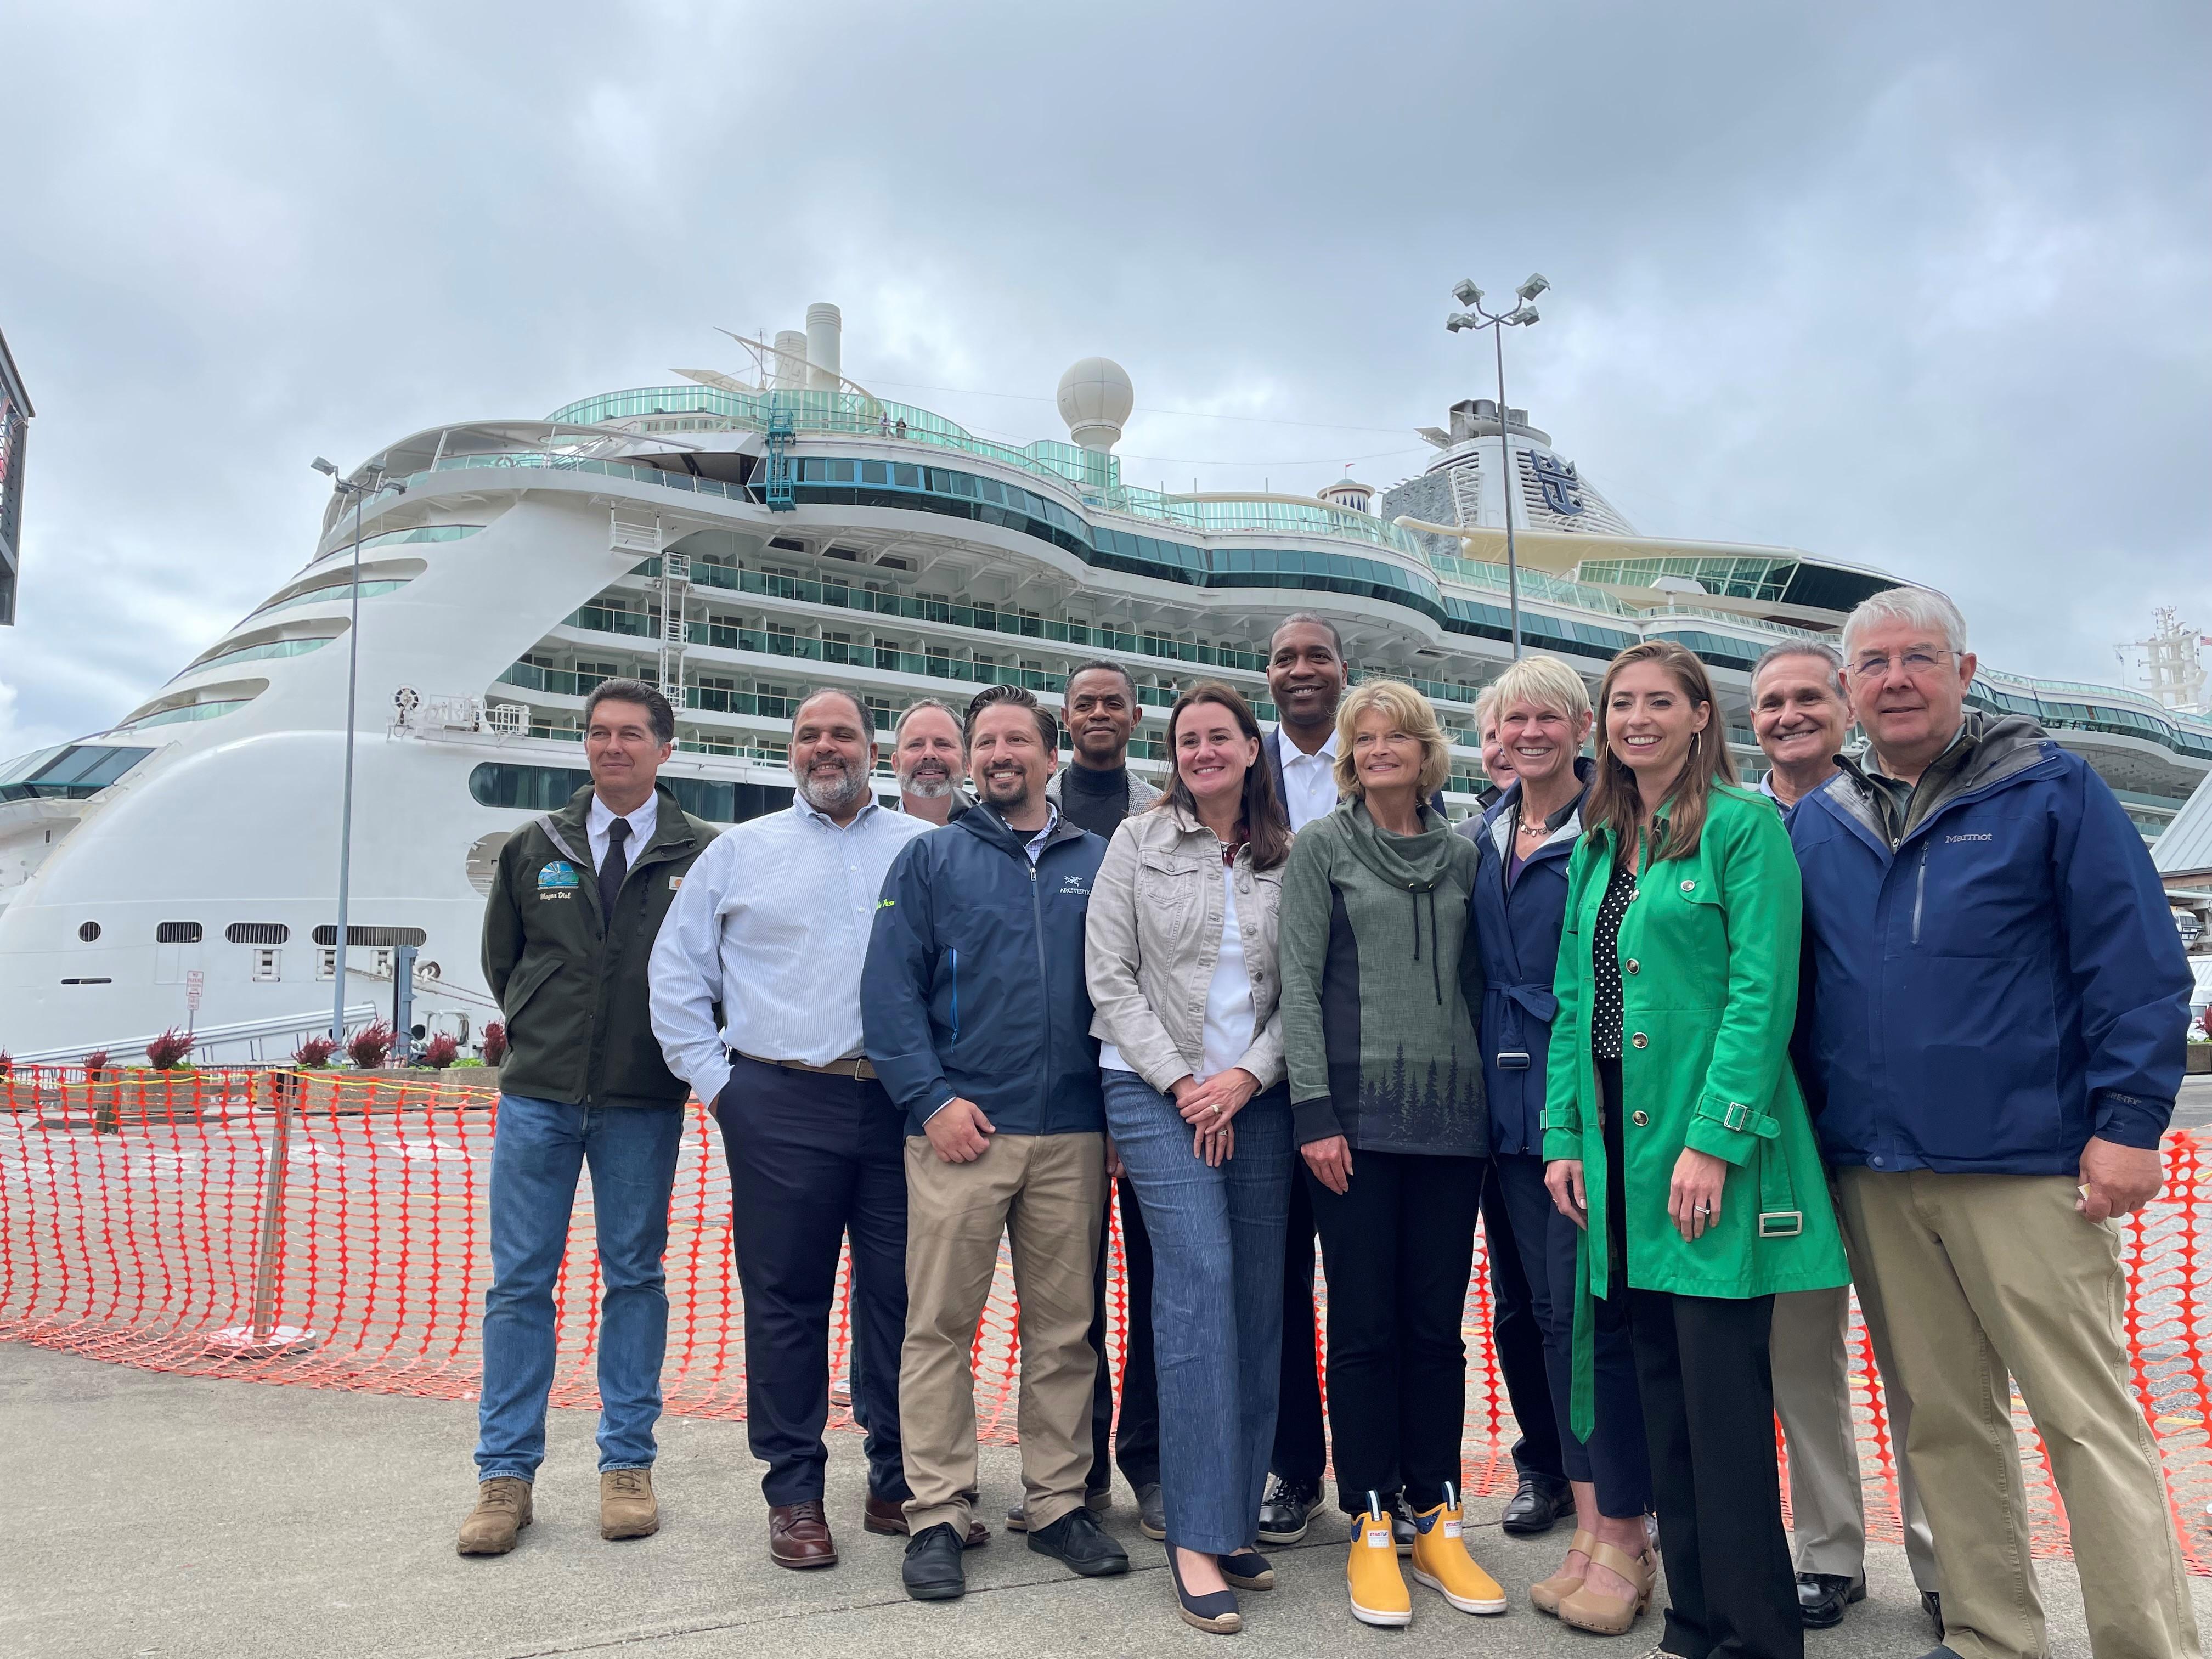 Cruise Ship Event 2